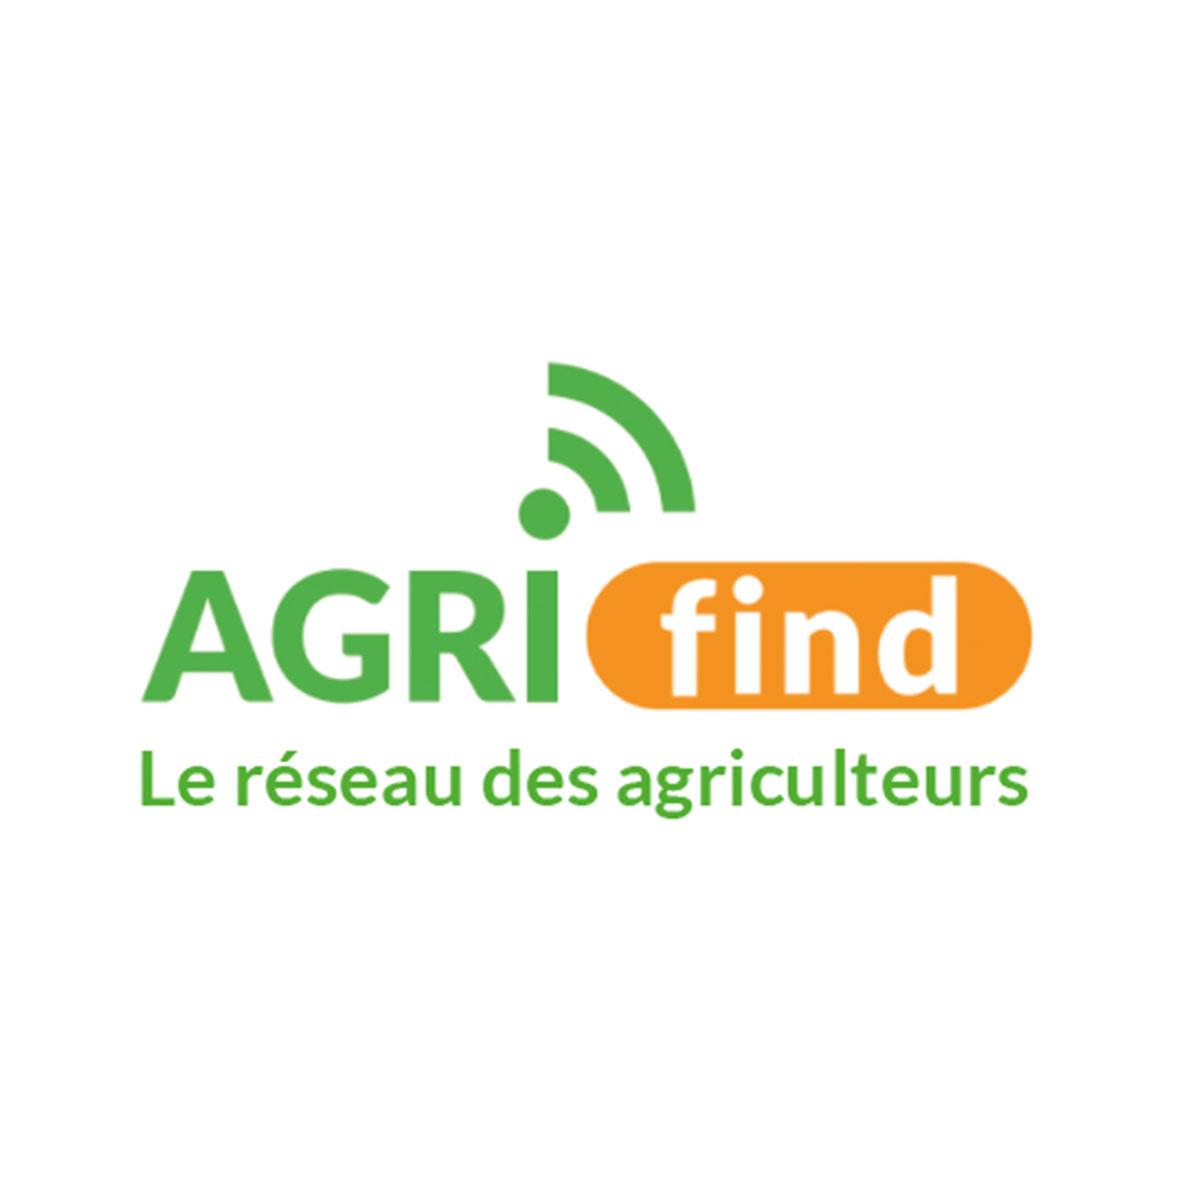 agrifind-partenaire-agroecologie